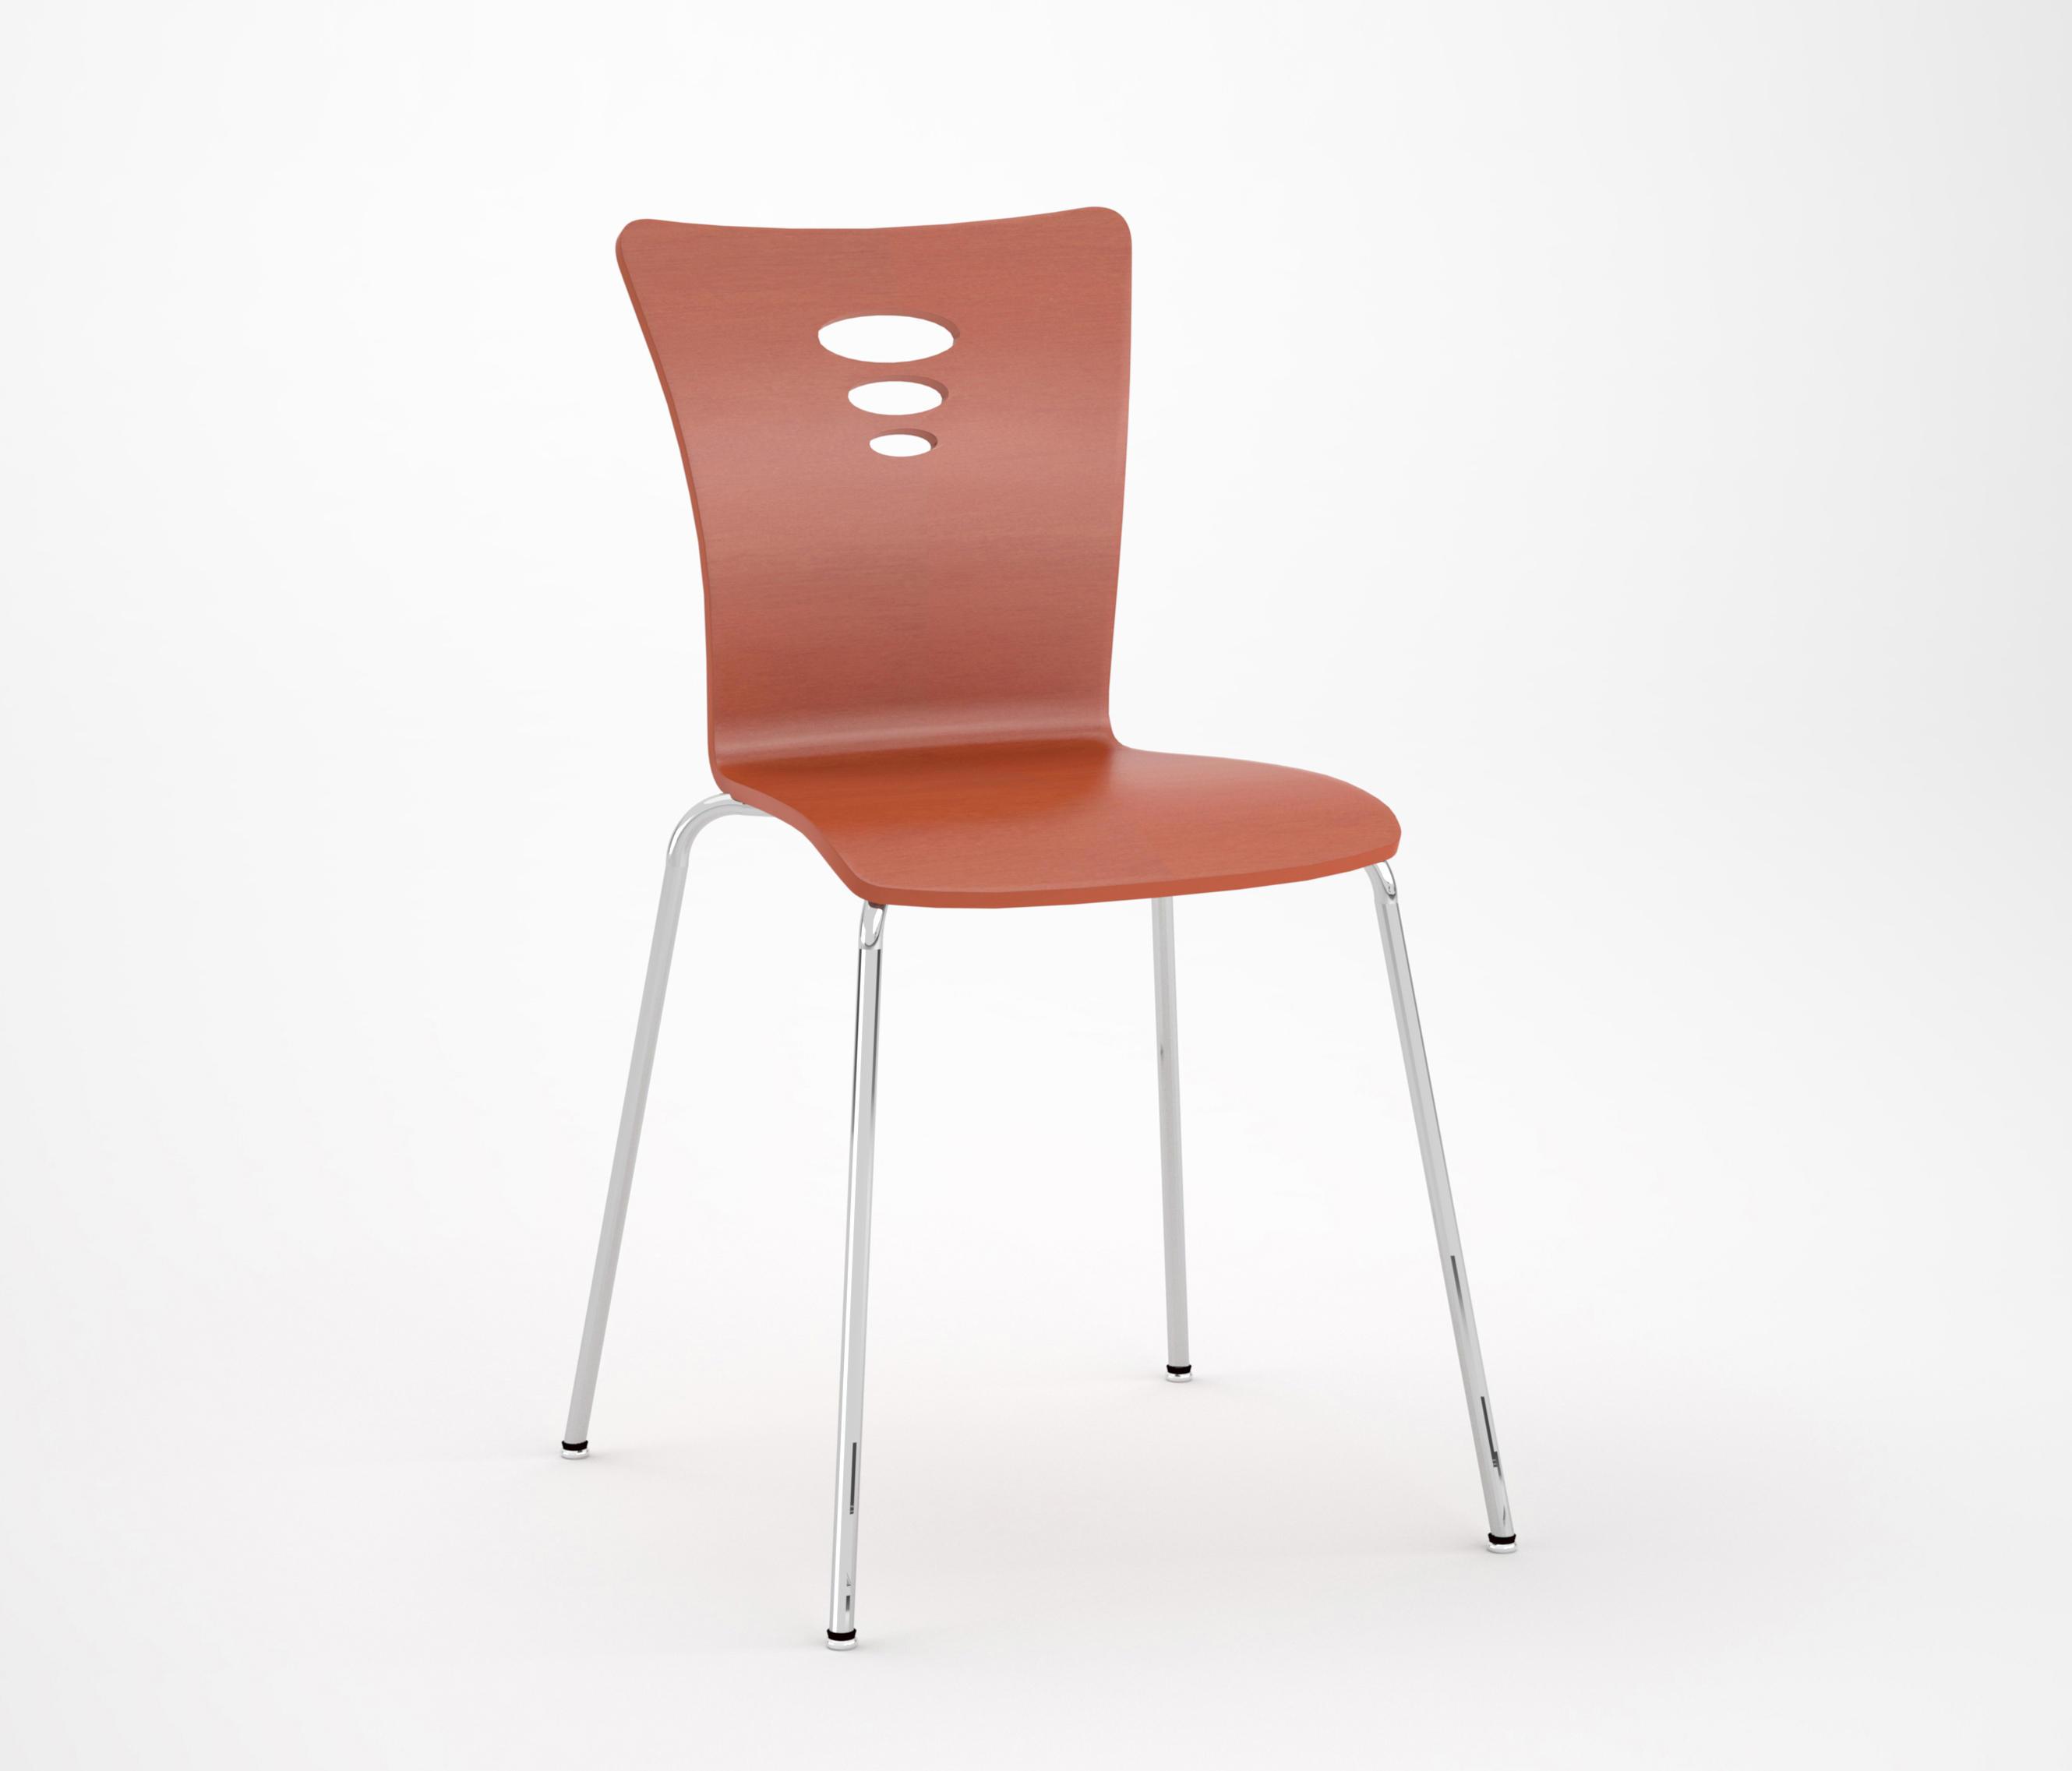 benton cafÉ chair chairs from erg international architonic